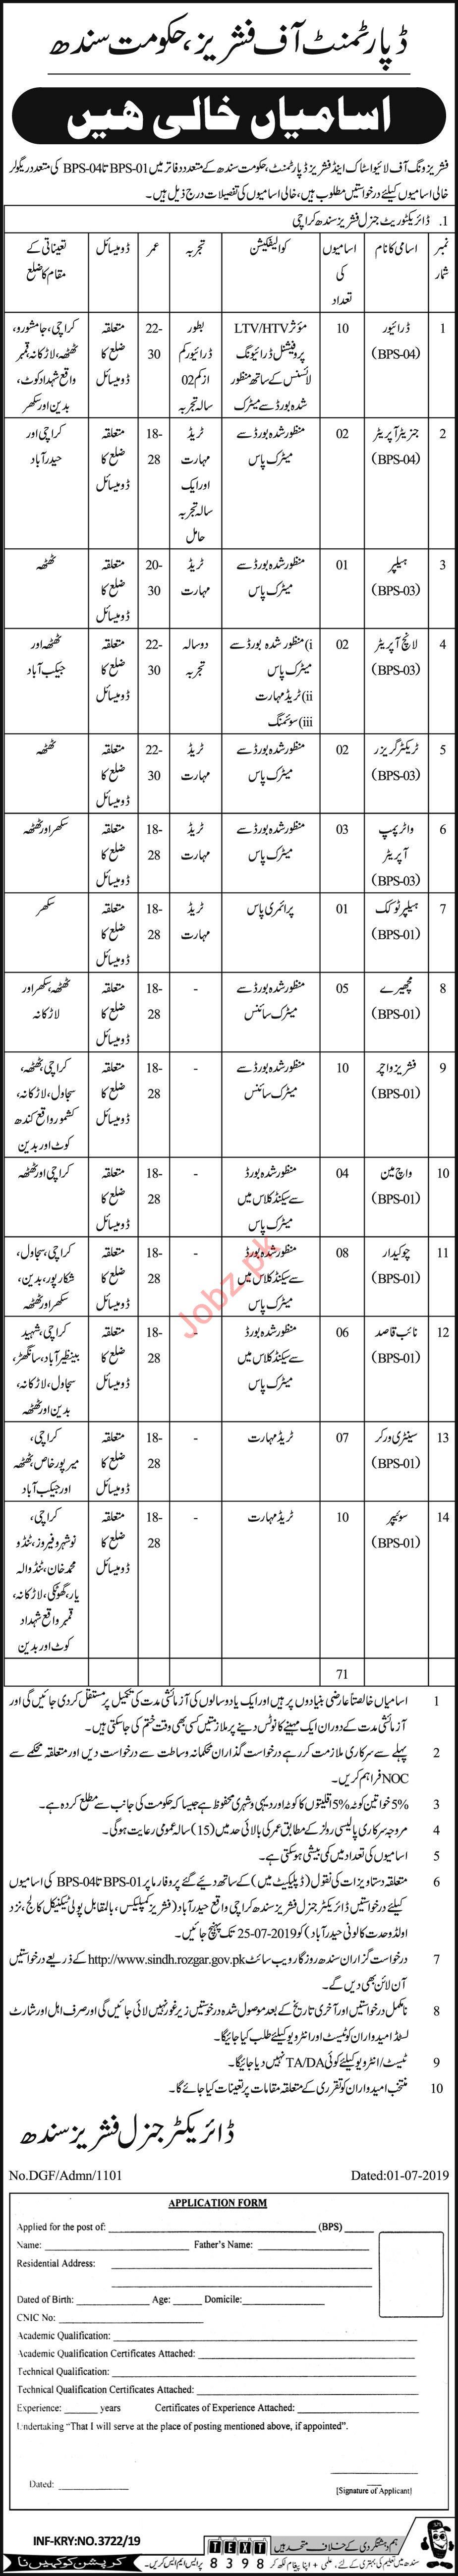 Department Of Fishers Karachi Jobs 2019